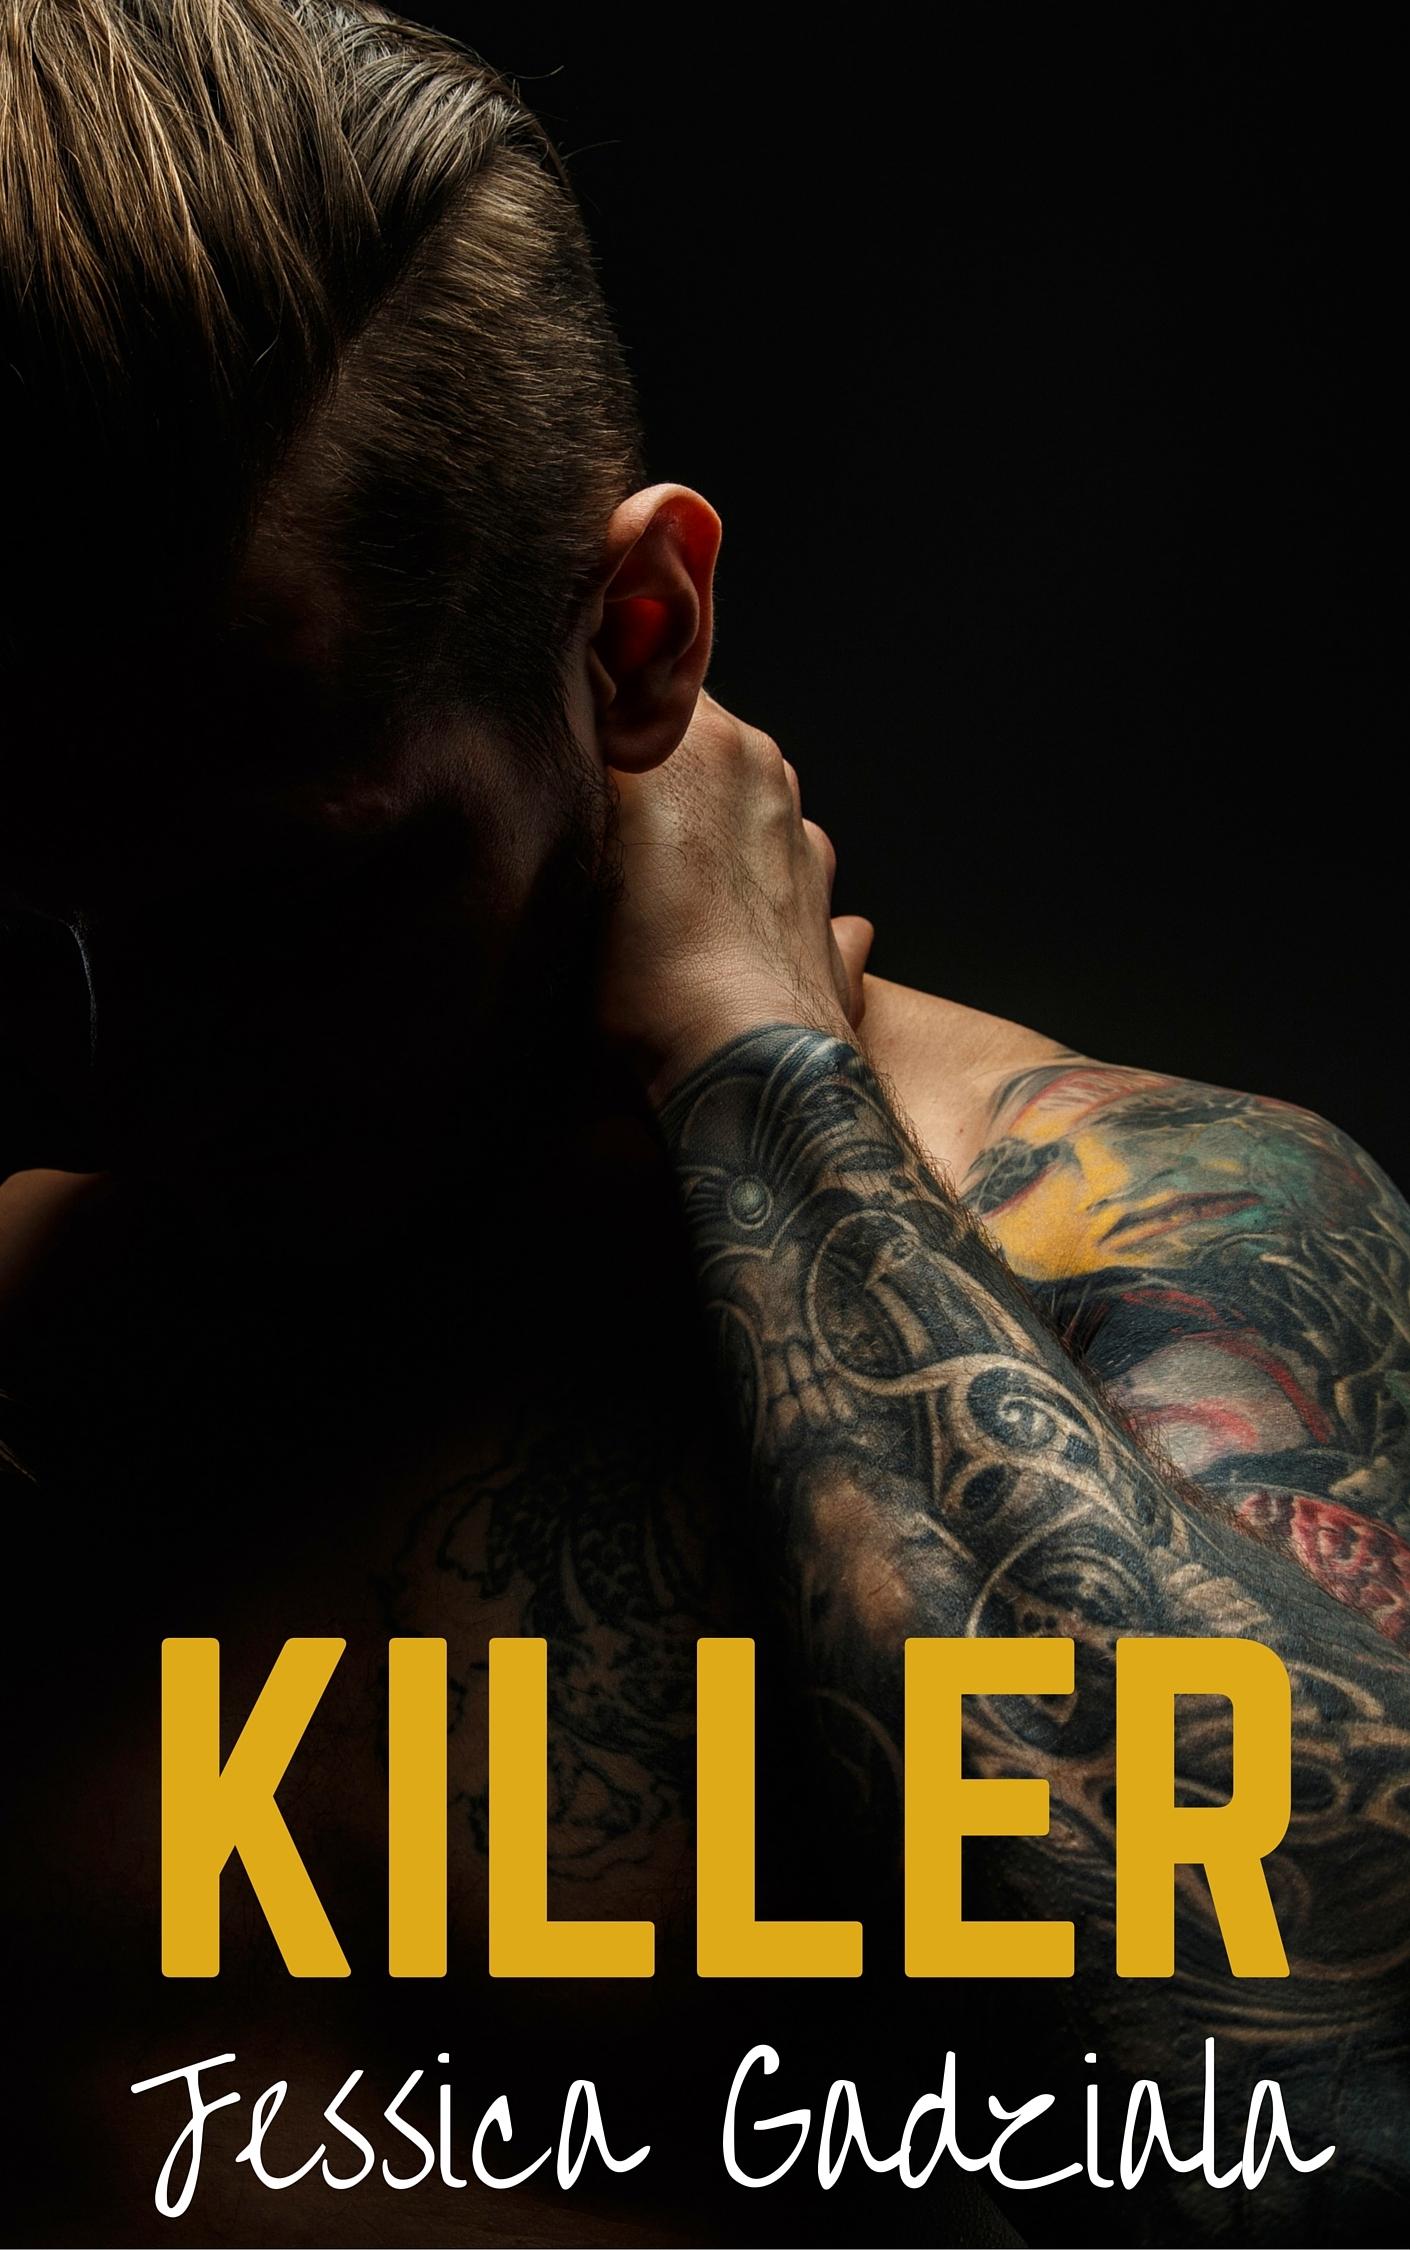 Jessica Gadziala - Savages 2 - Killer